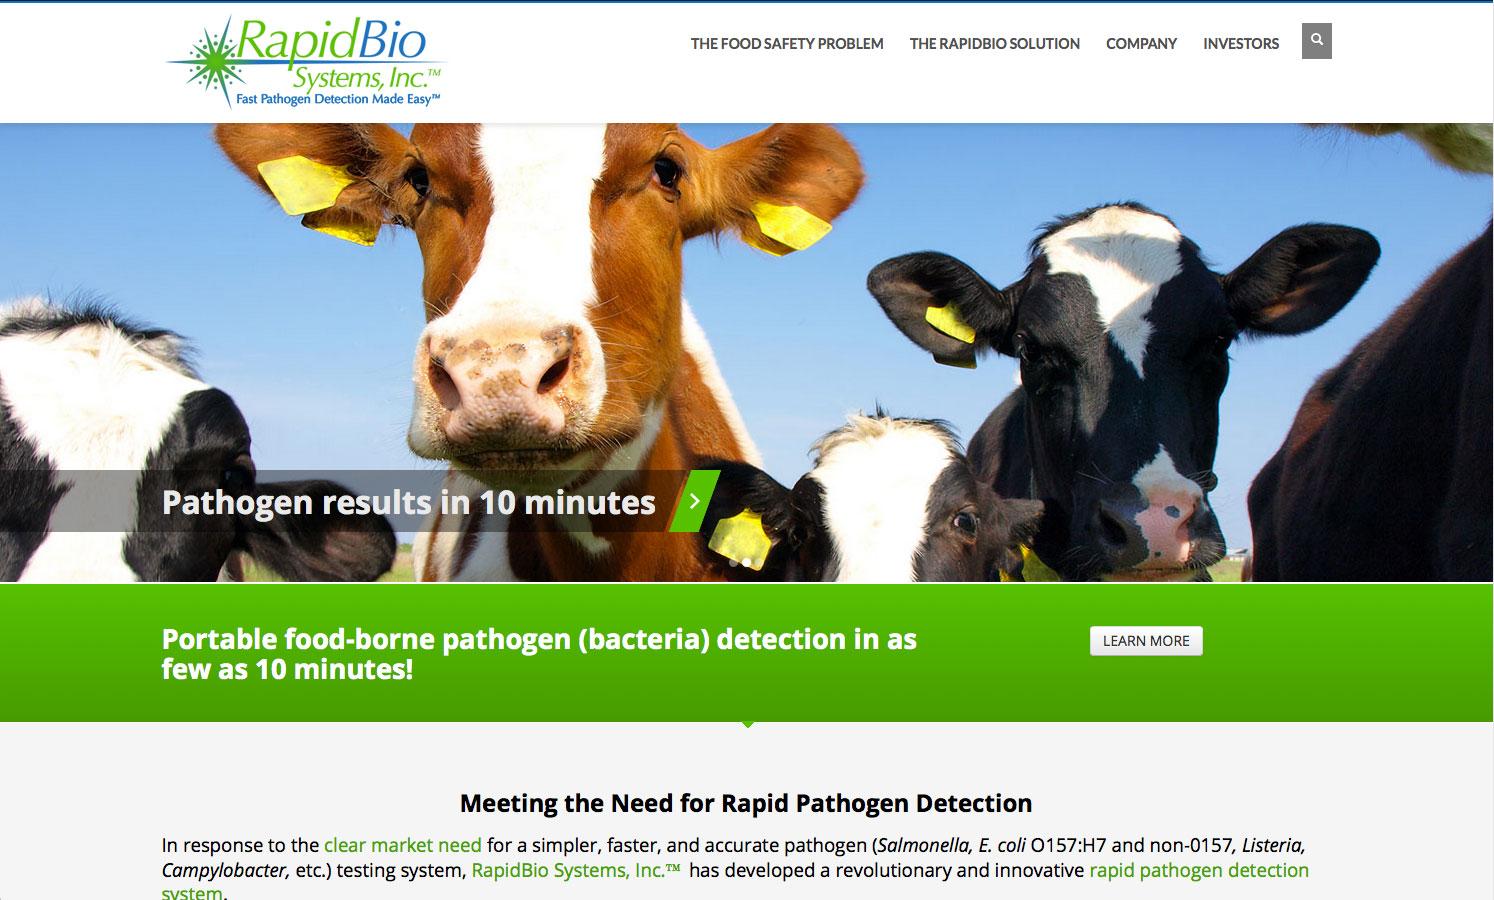 RapidBio Systems Website